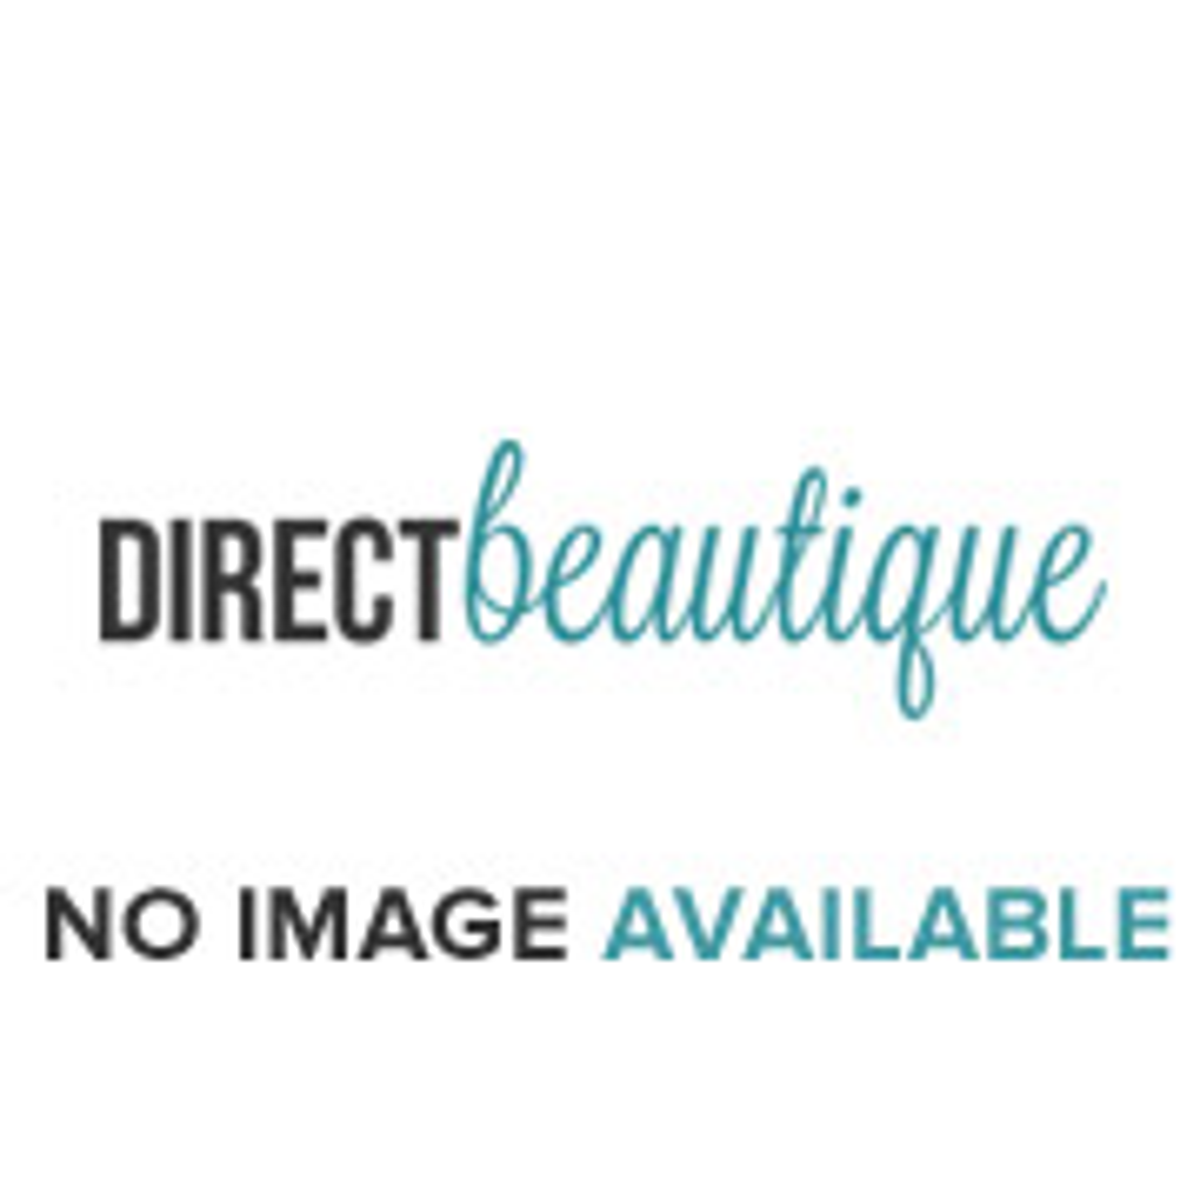 Azzaro Solarissimo Marettimo 75ml Spray